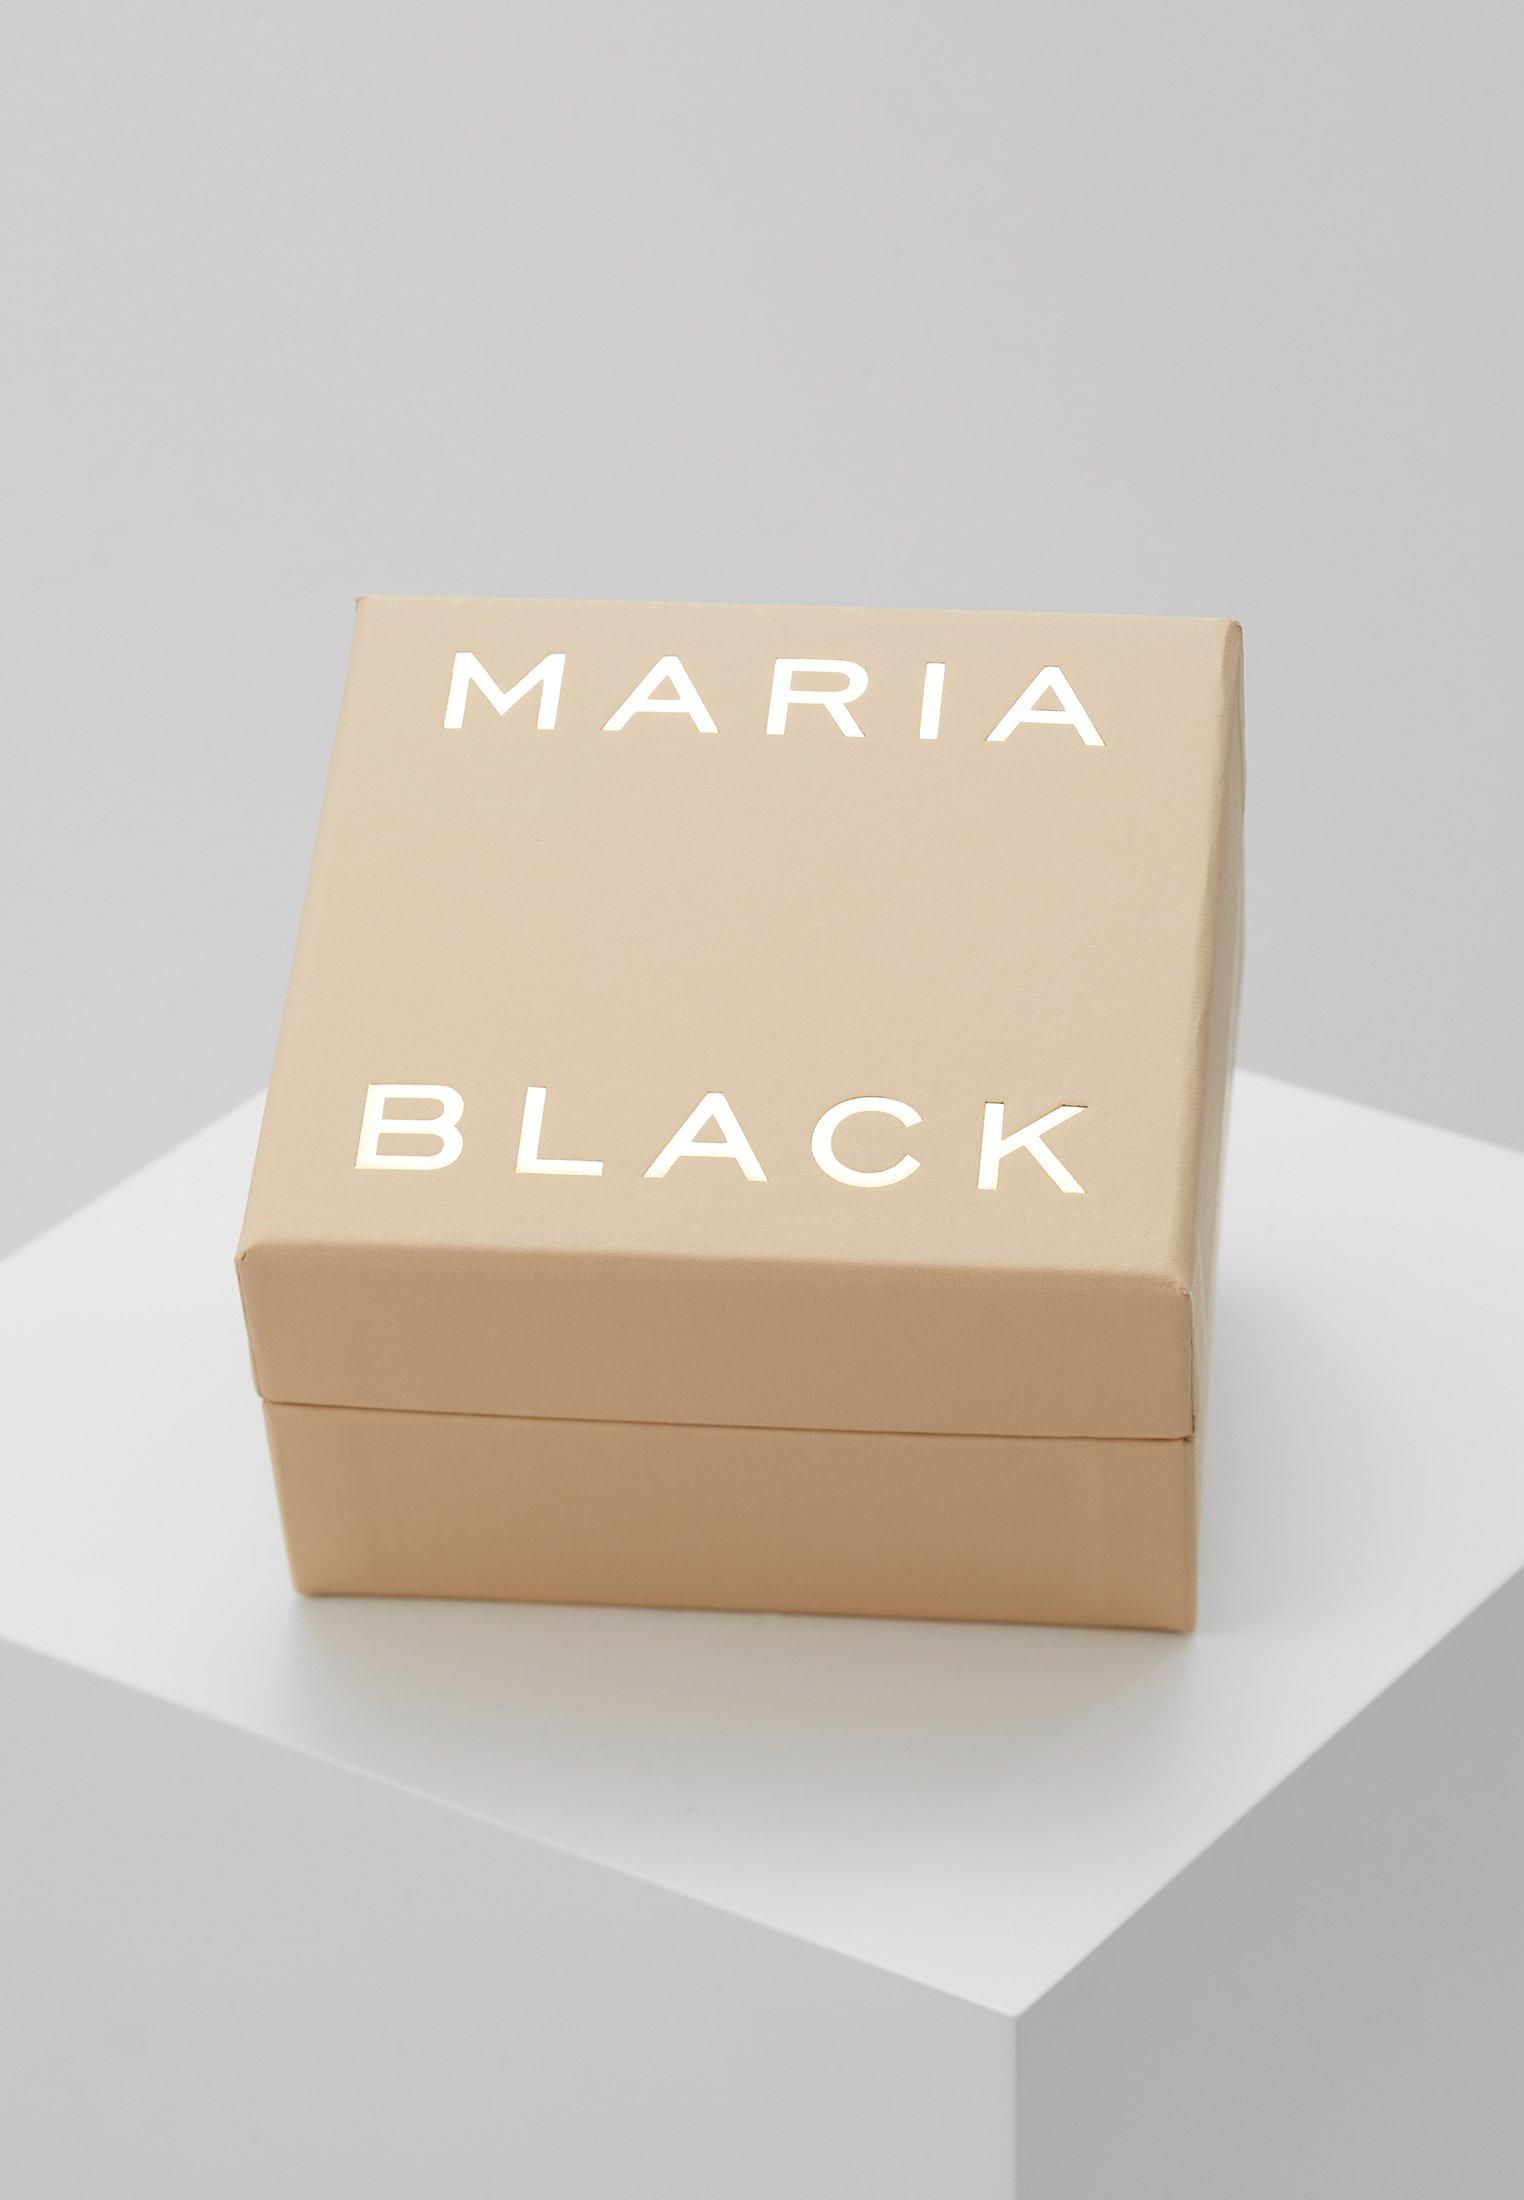 Maria Black Friend Charm Bracelet Medium - Armband Gold-coloured